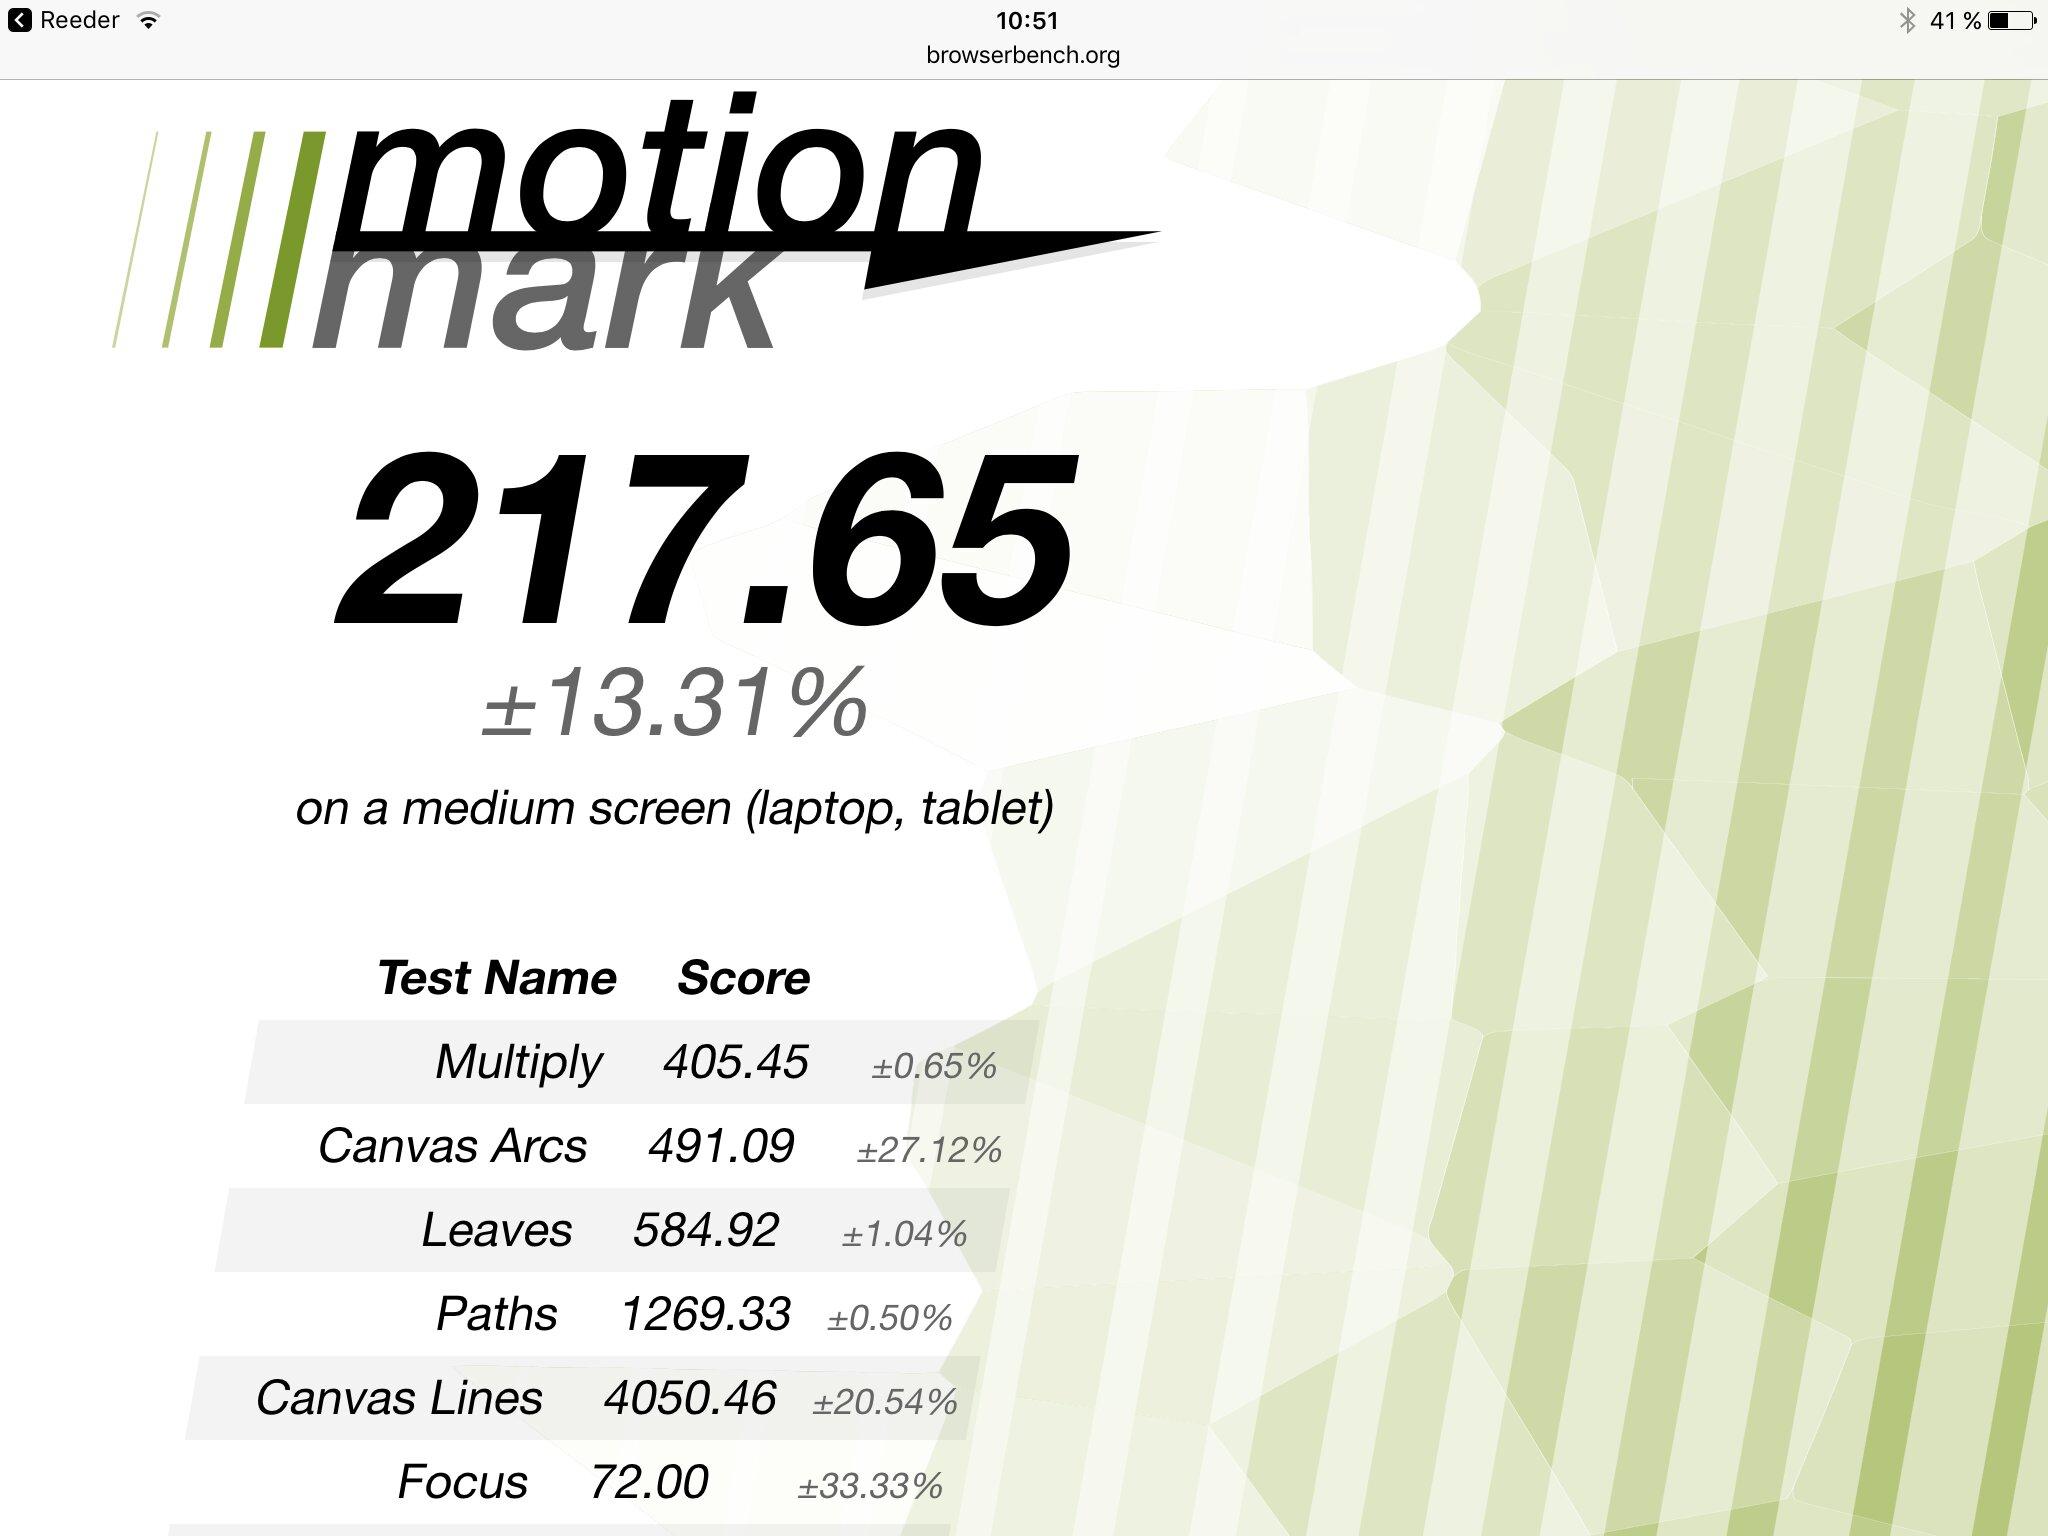 Результат работы MotionMark